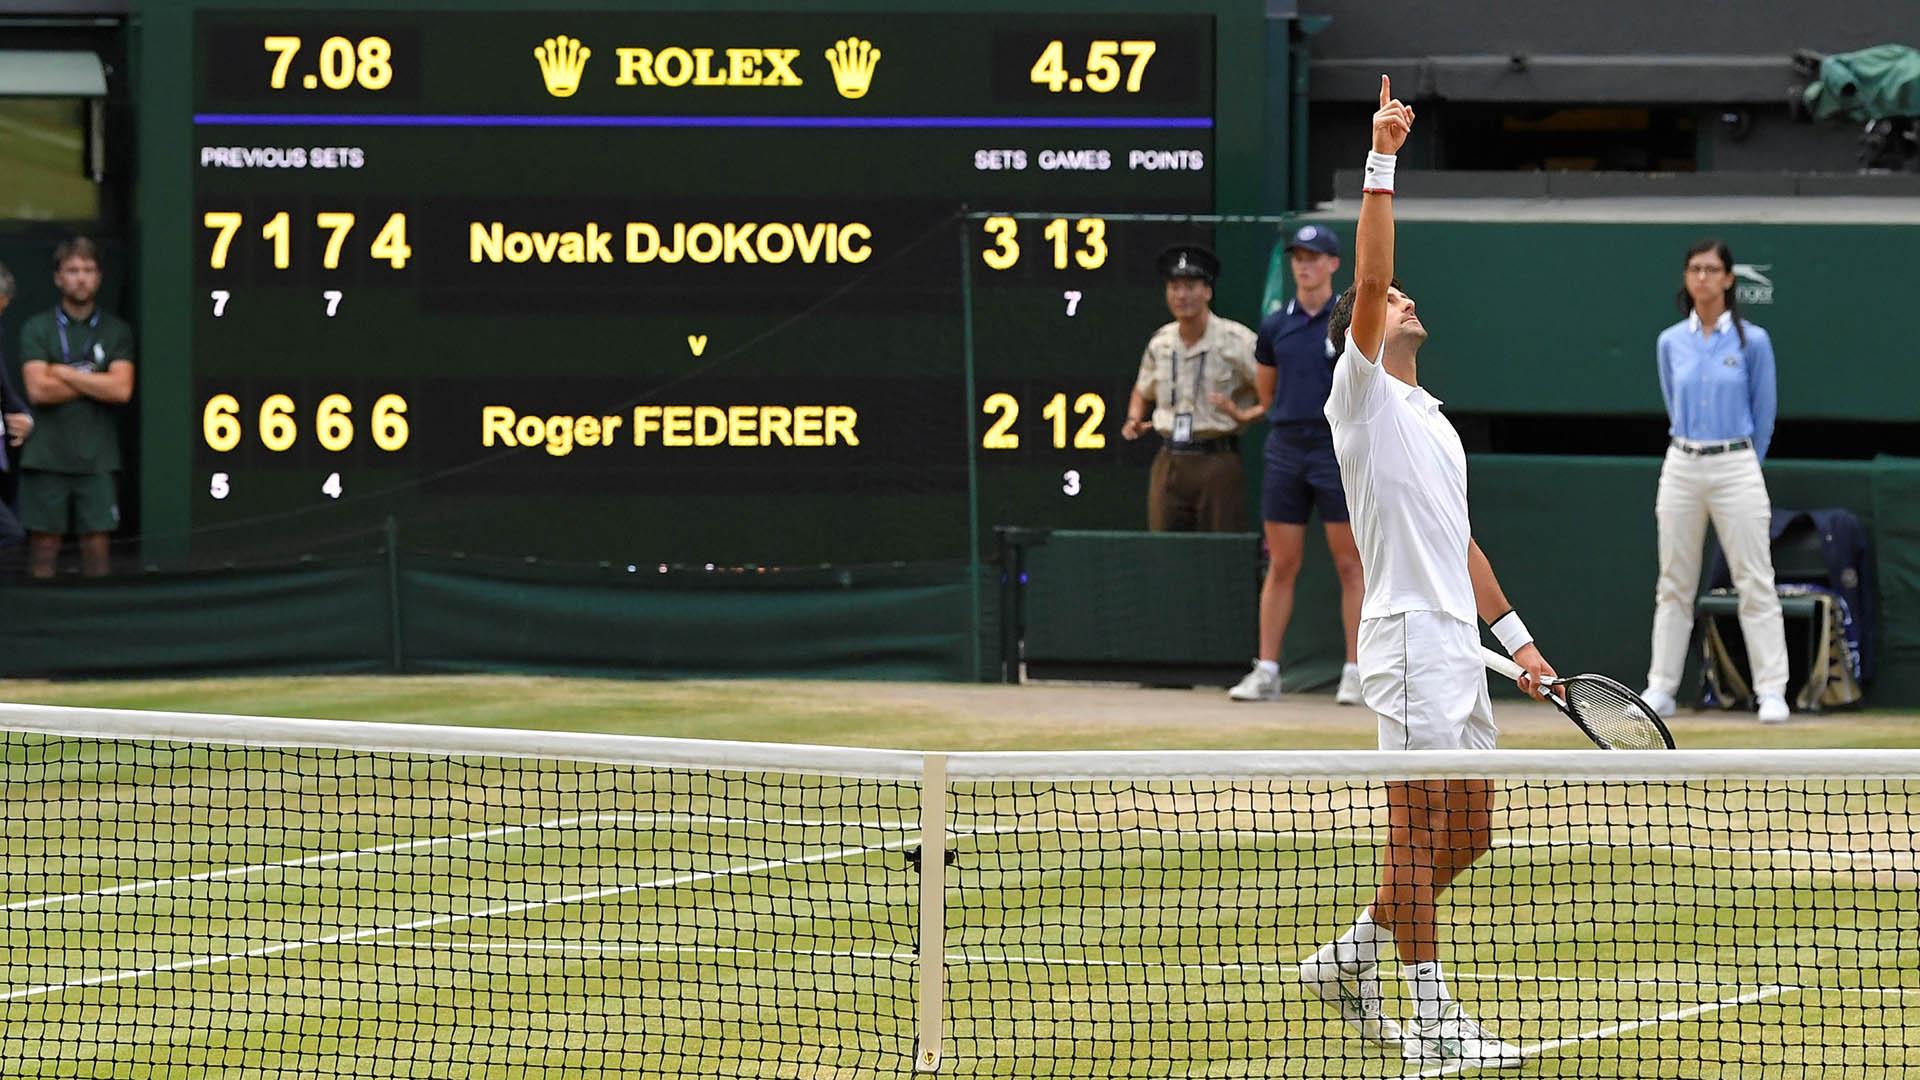 Djokovic conquistó su quinto título en Wimbledon (REUTERS)